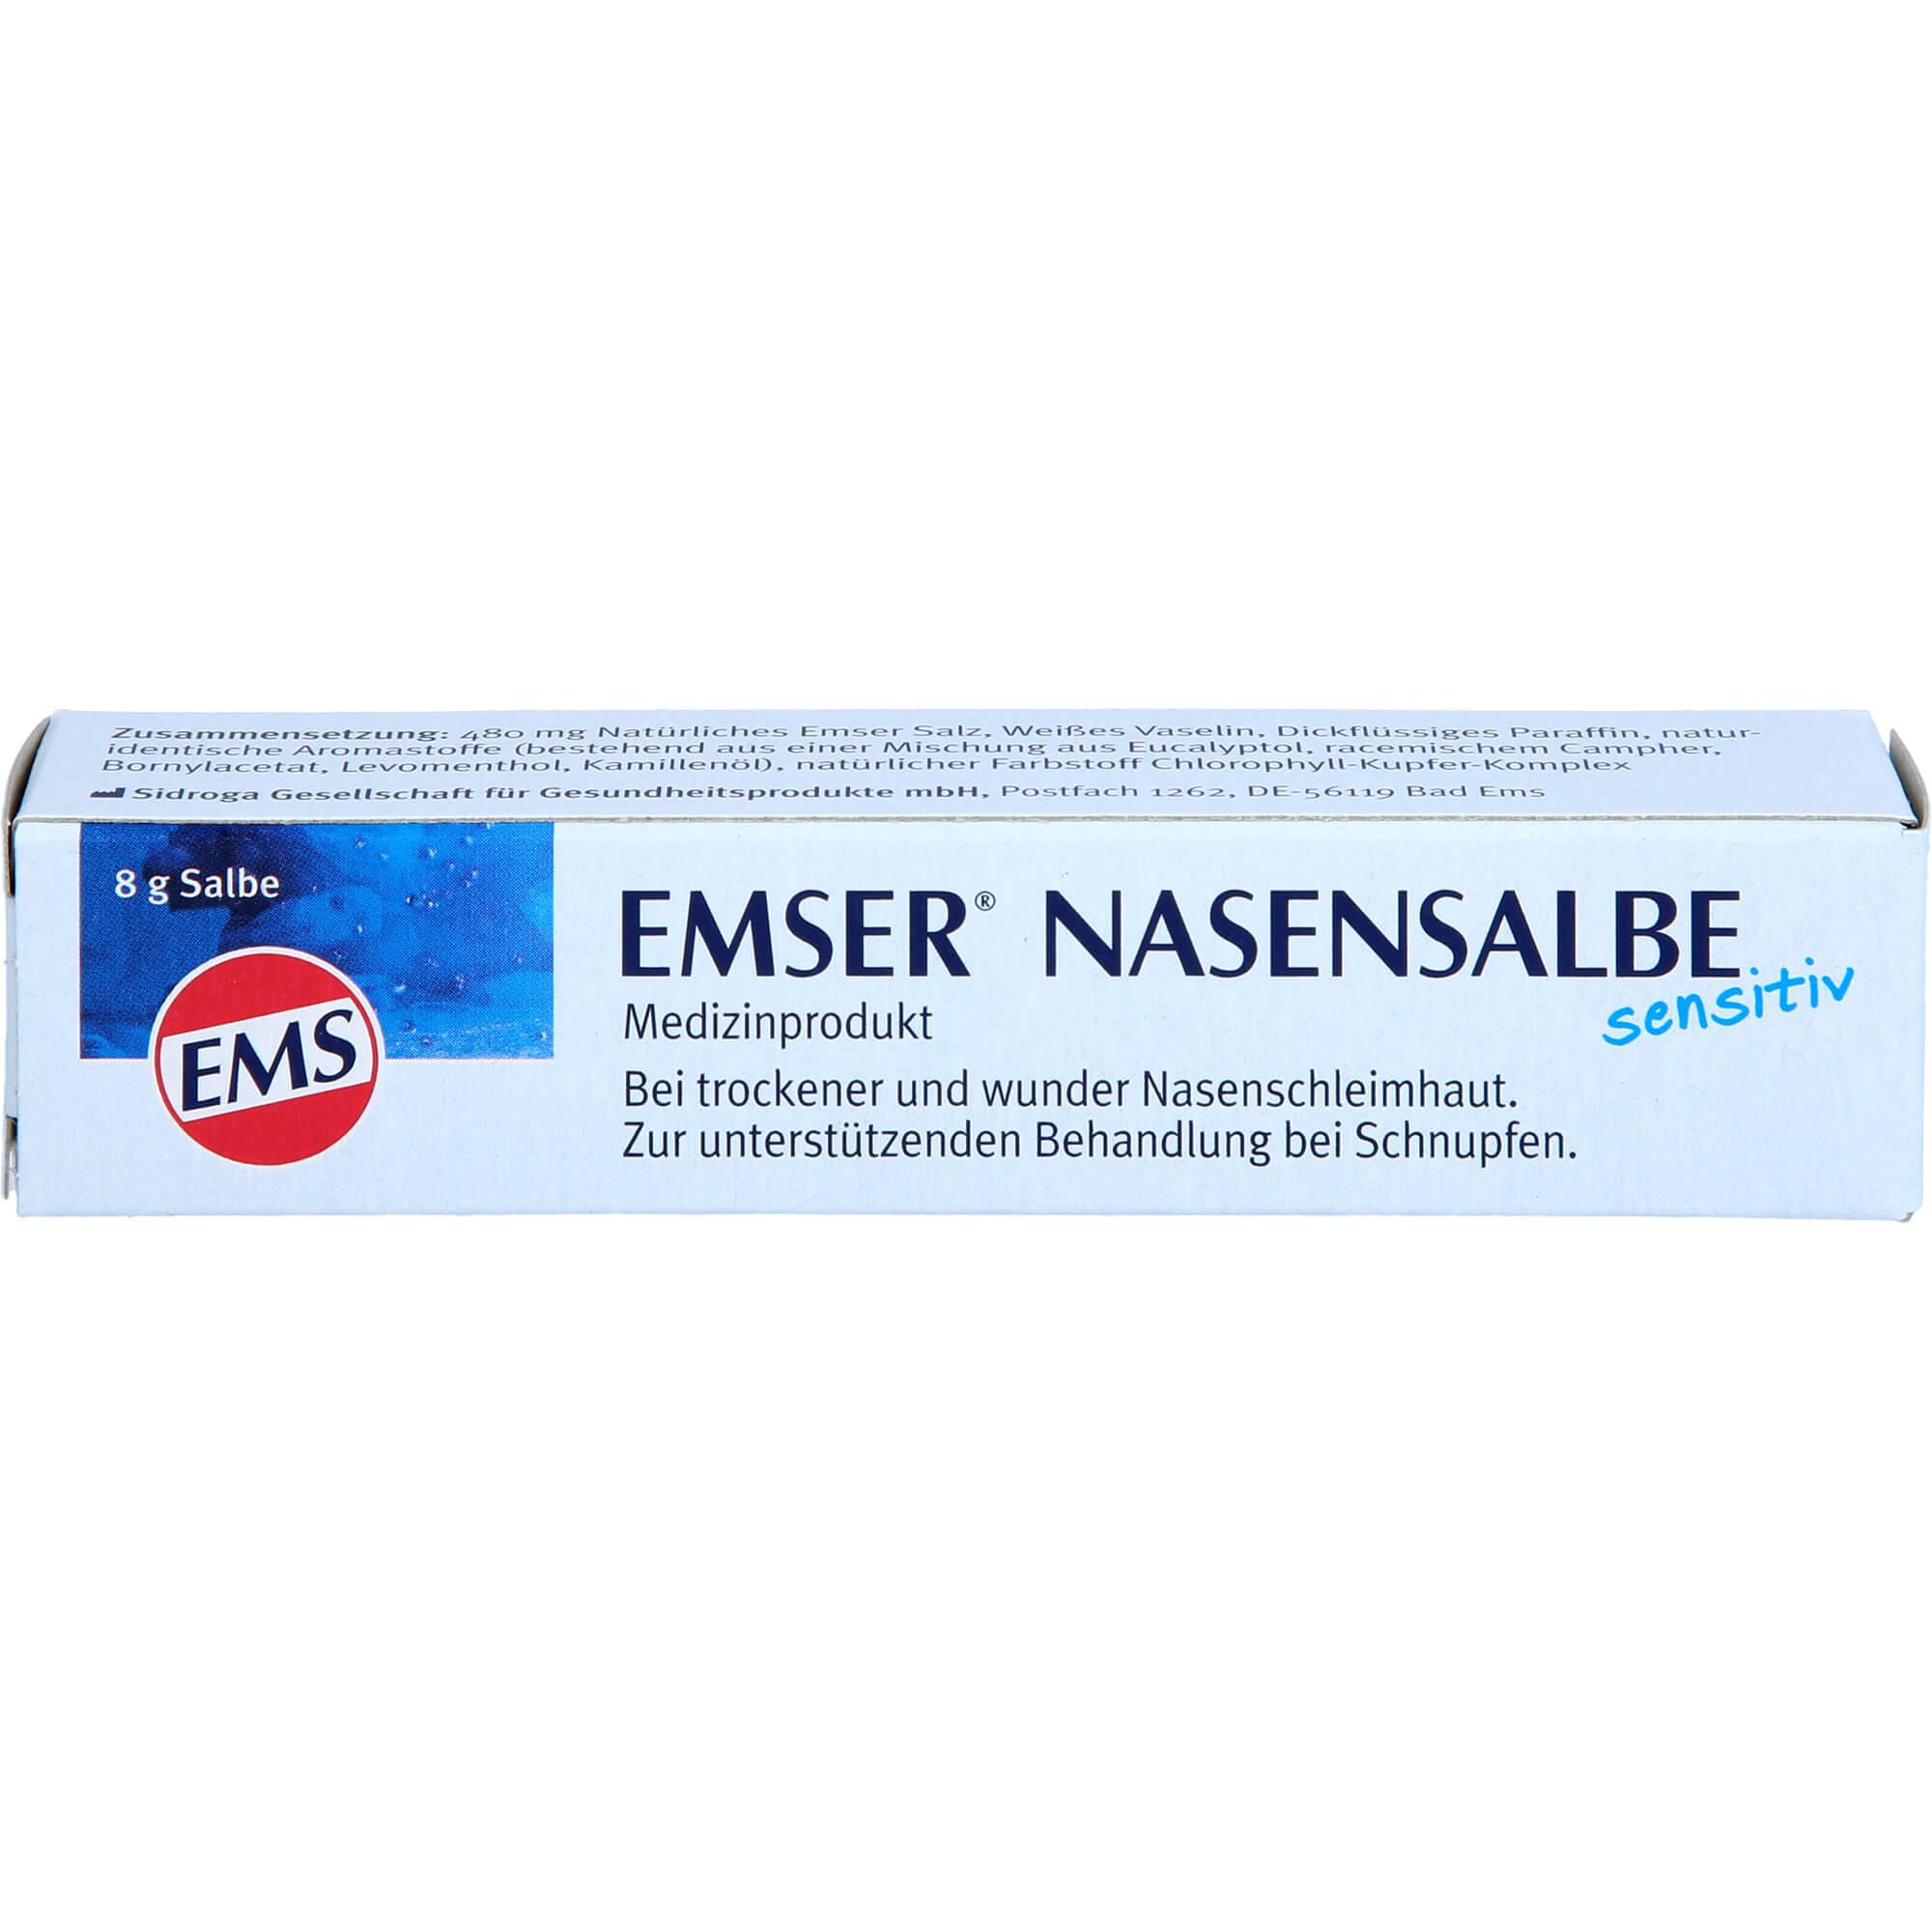 EMSER-Nasensalbe-Sensitiv